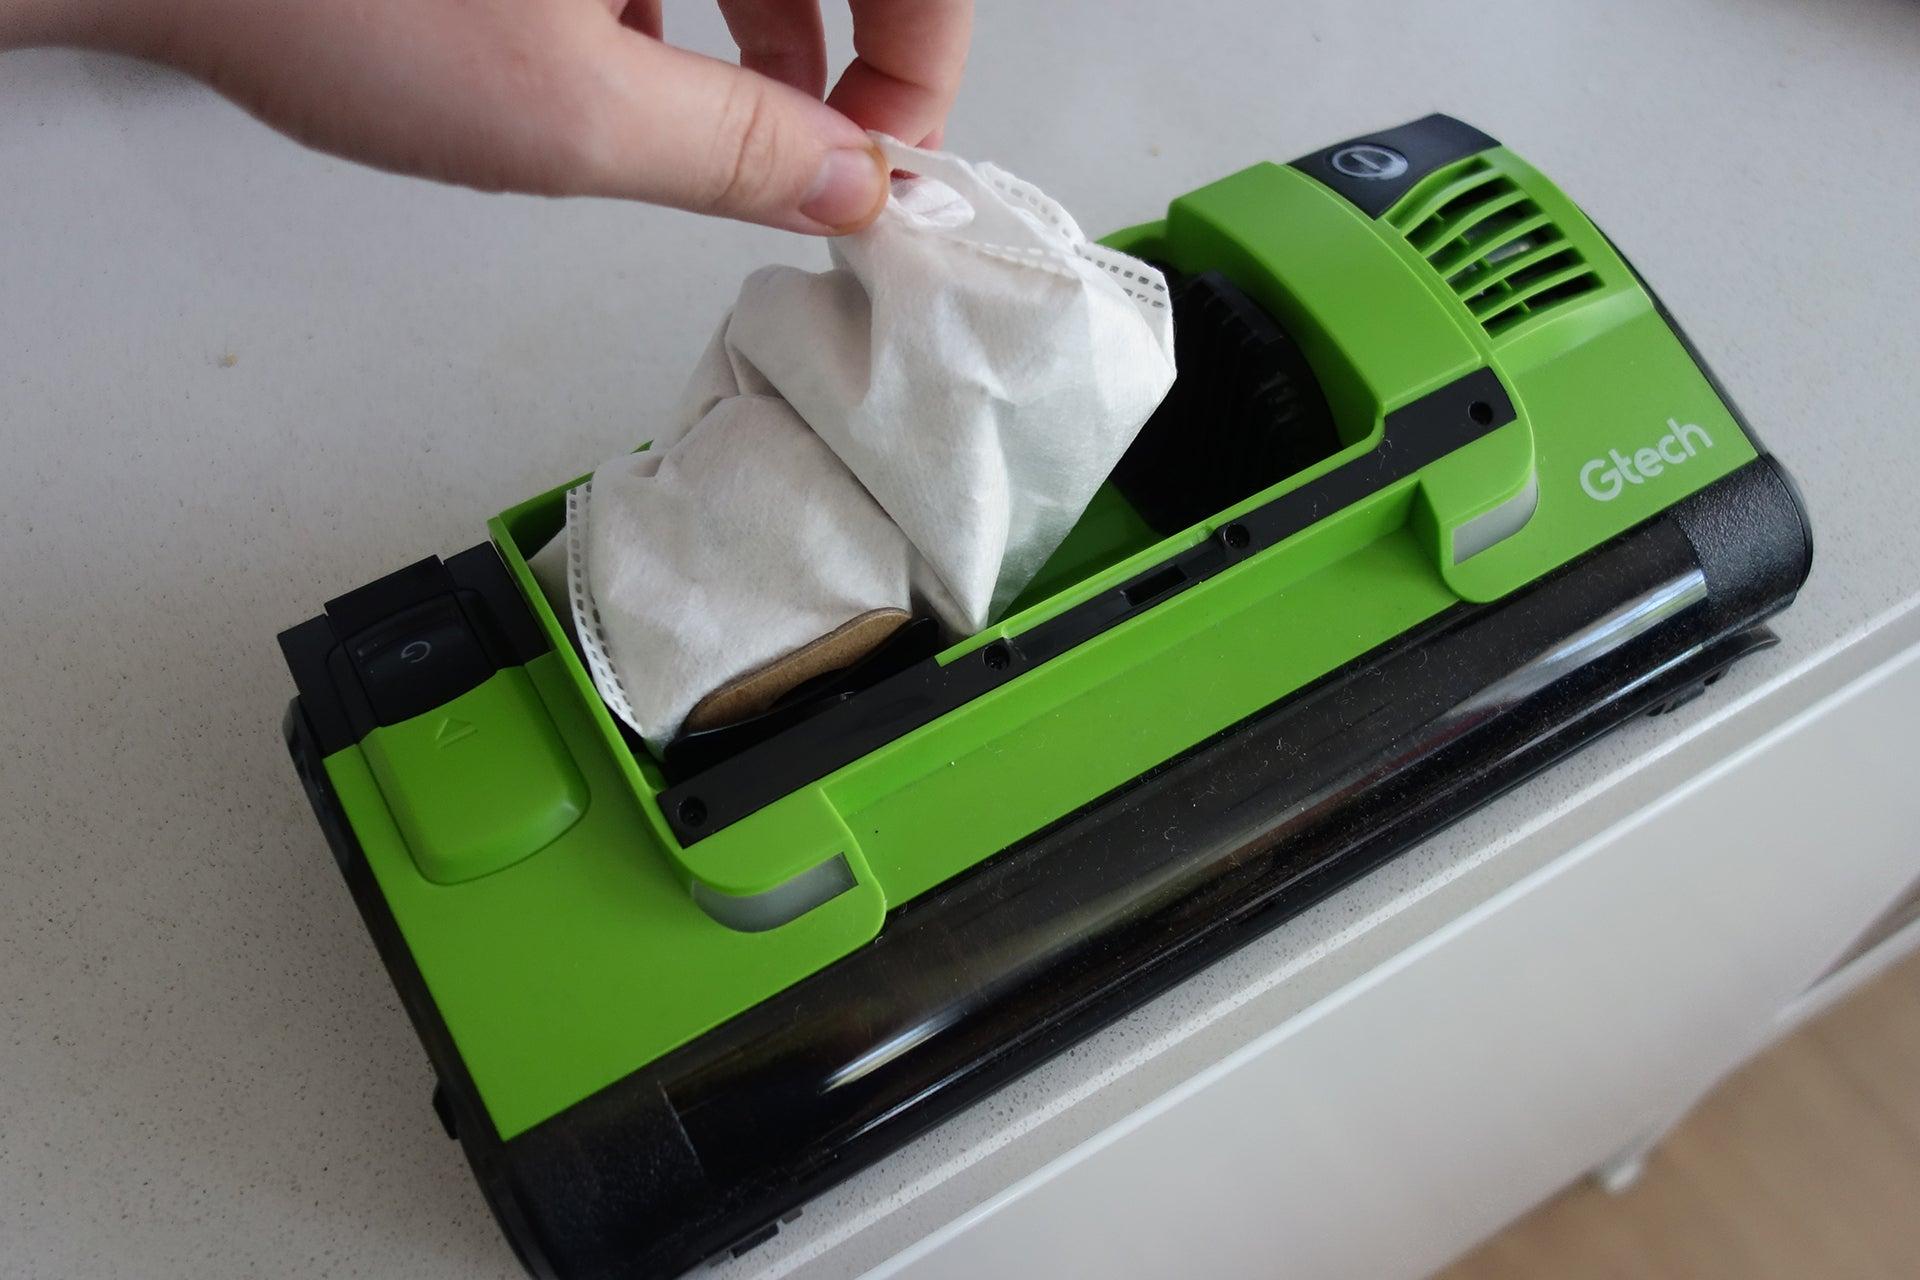 Gtech Hylite removing bag